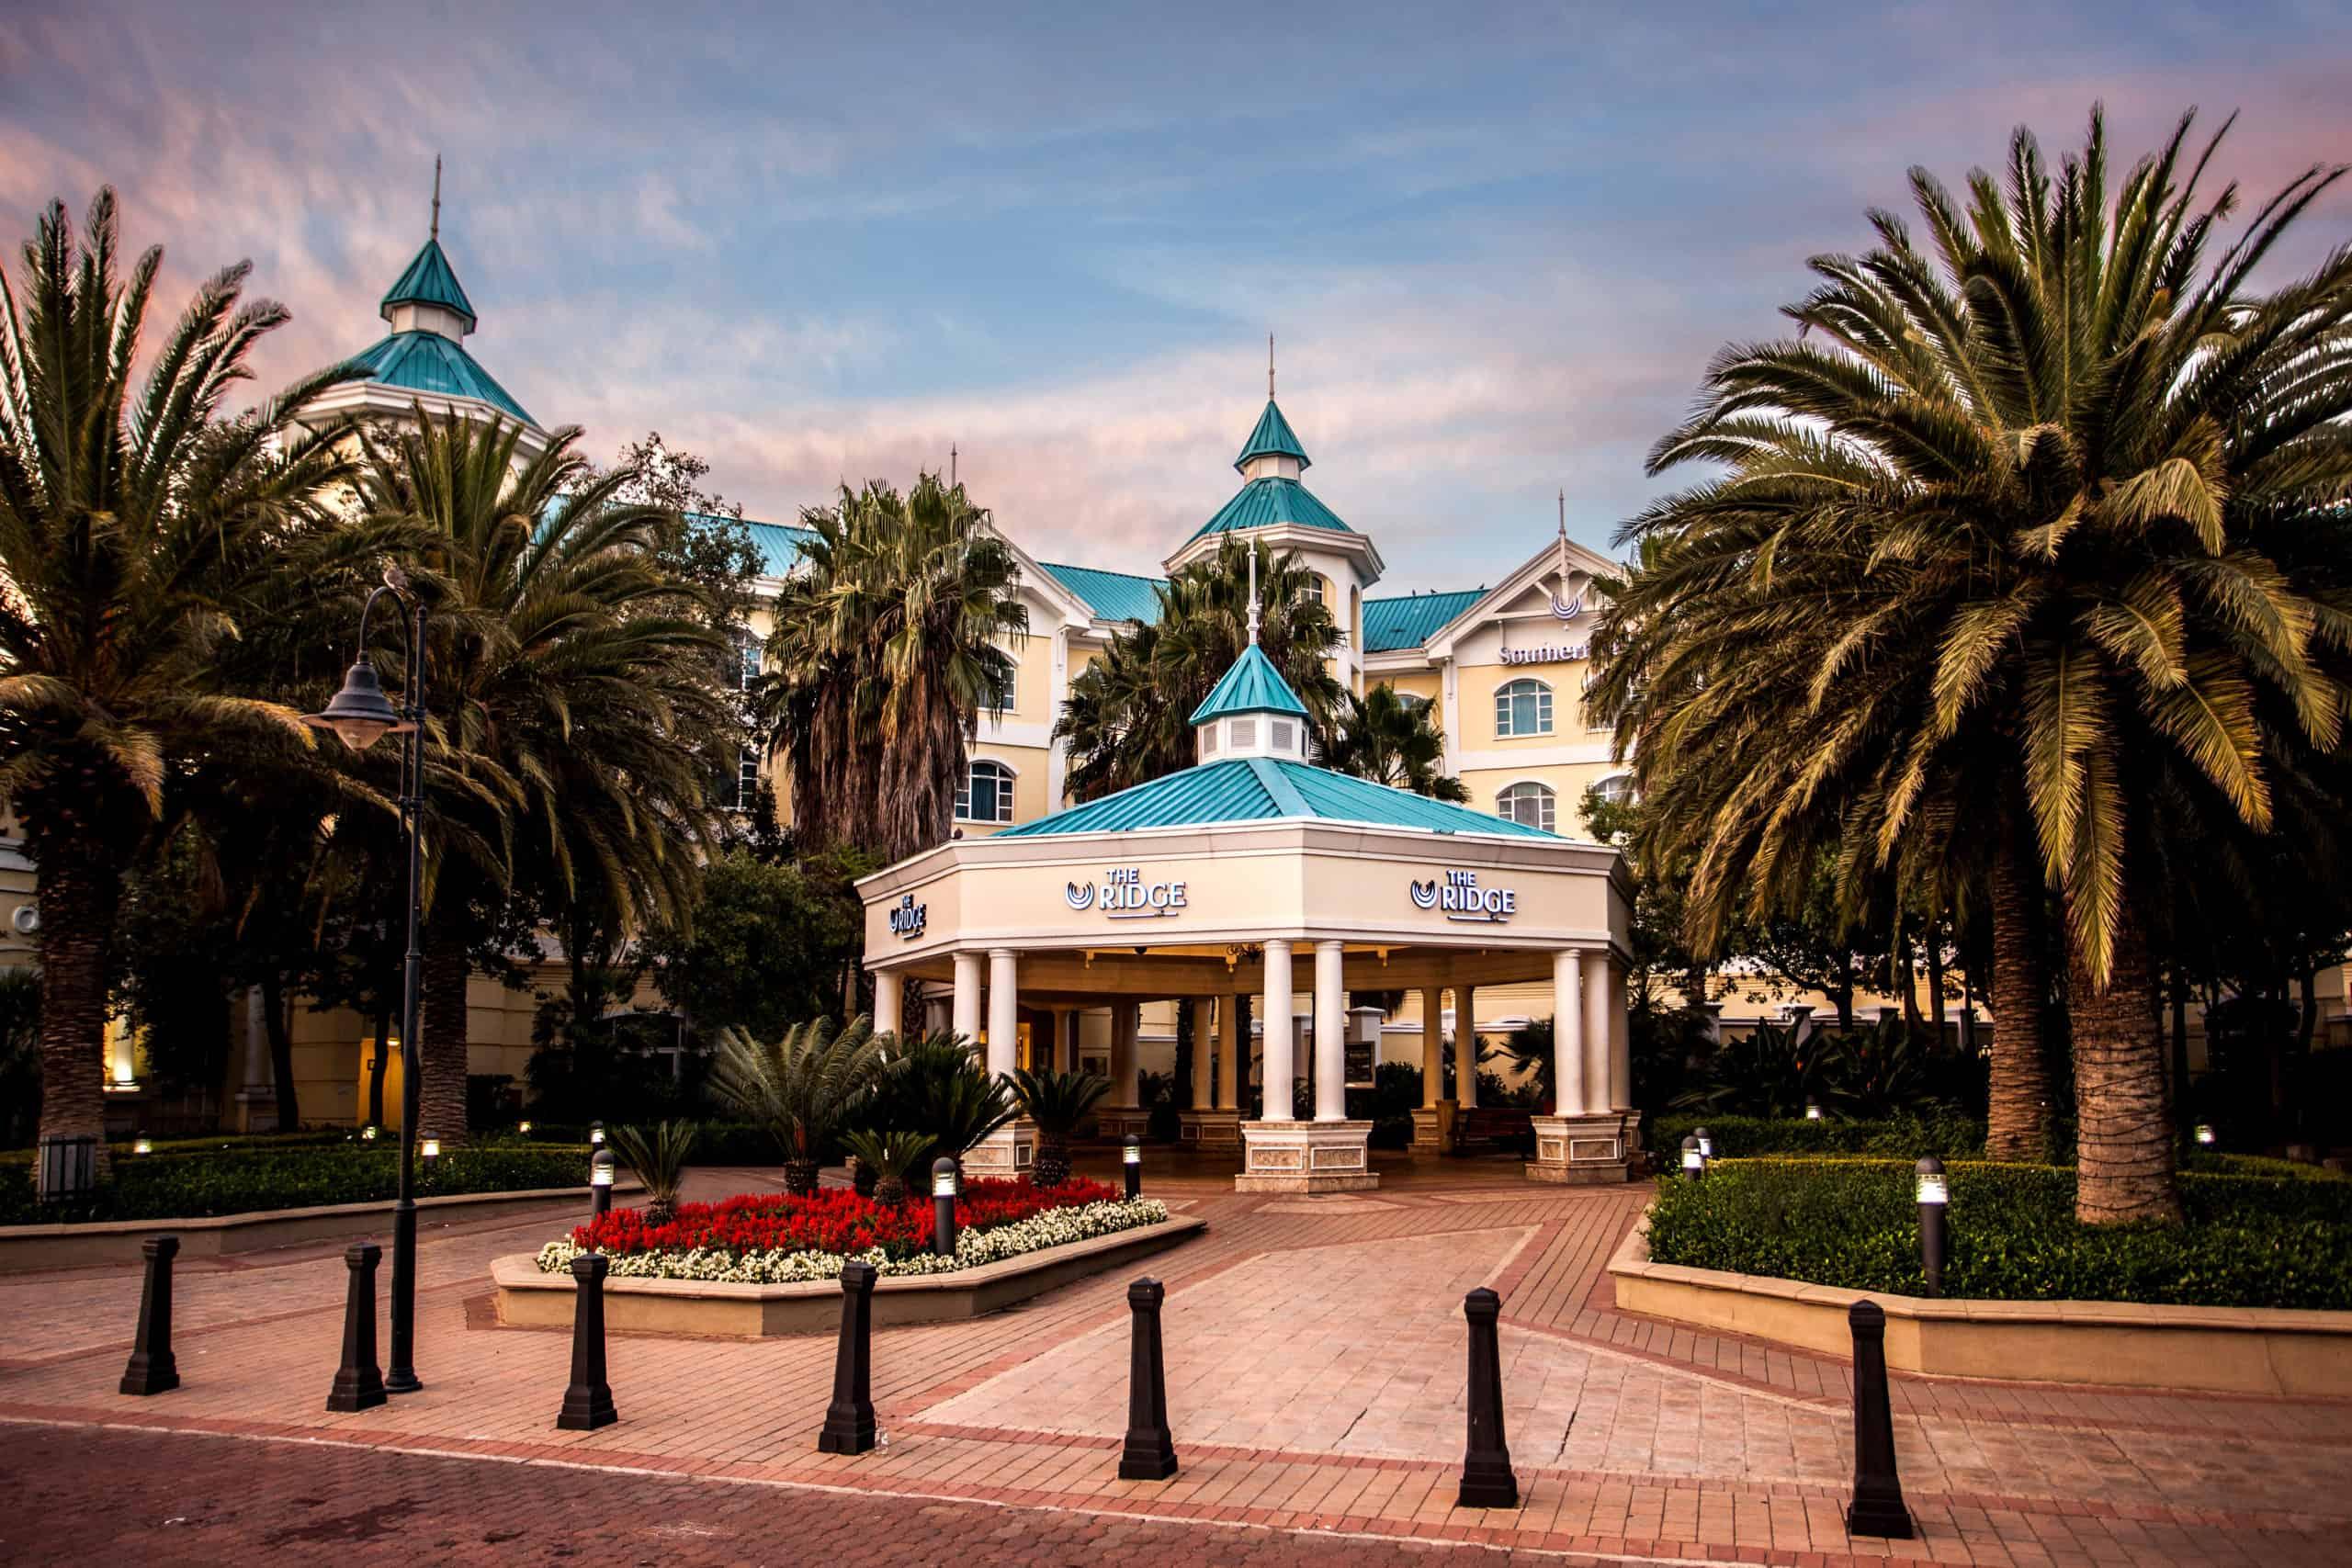 The Ridge Casino's main entrance